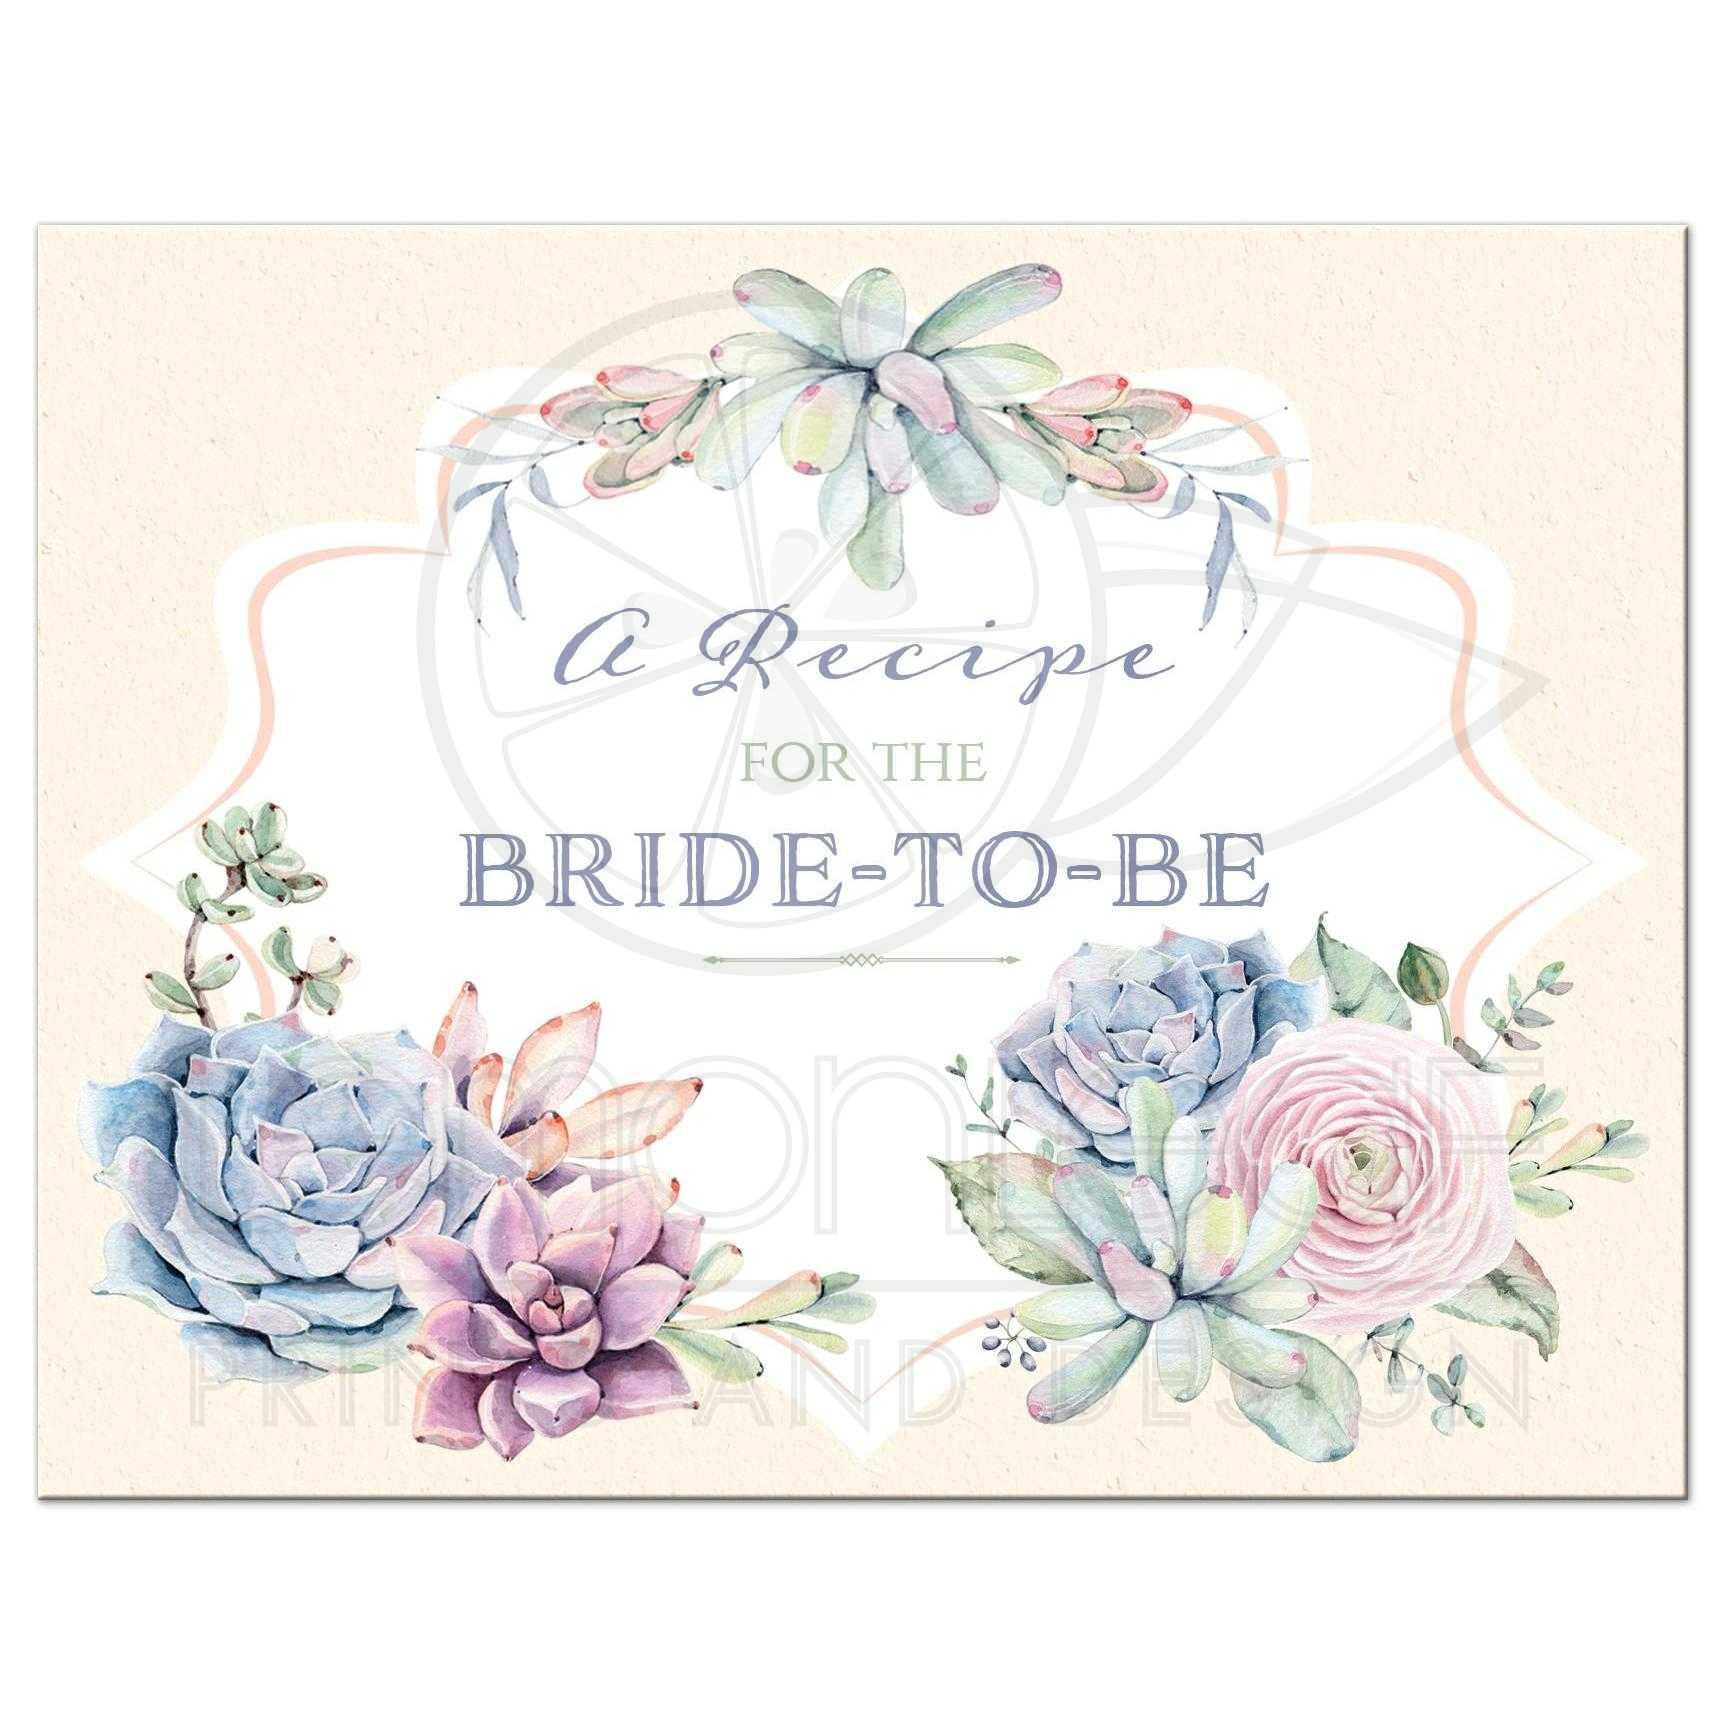 Recipe Card Pastel Watercolors Succulents Blue Lavender Peach Pink Sage Green